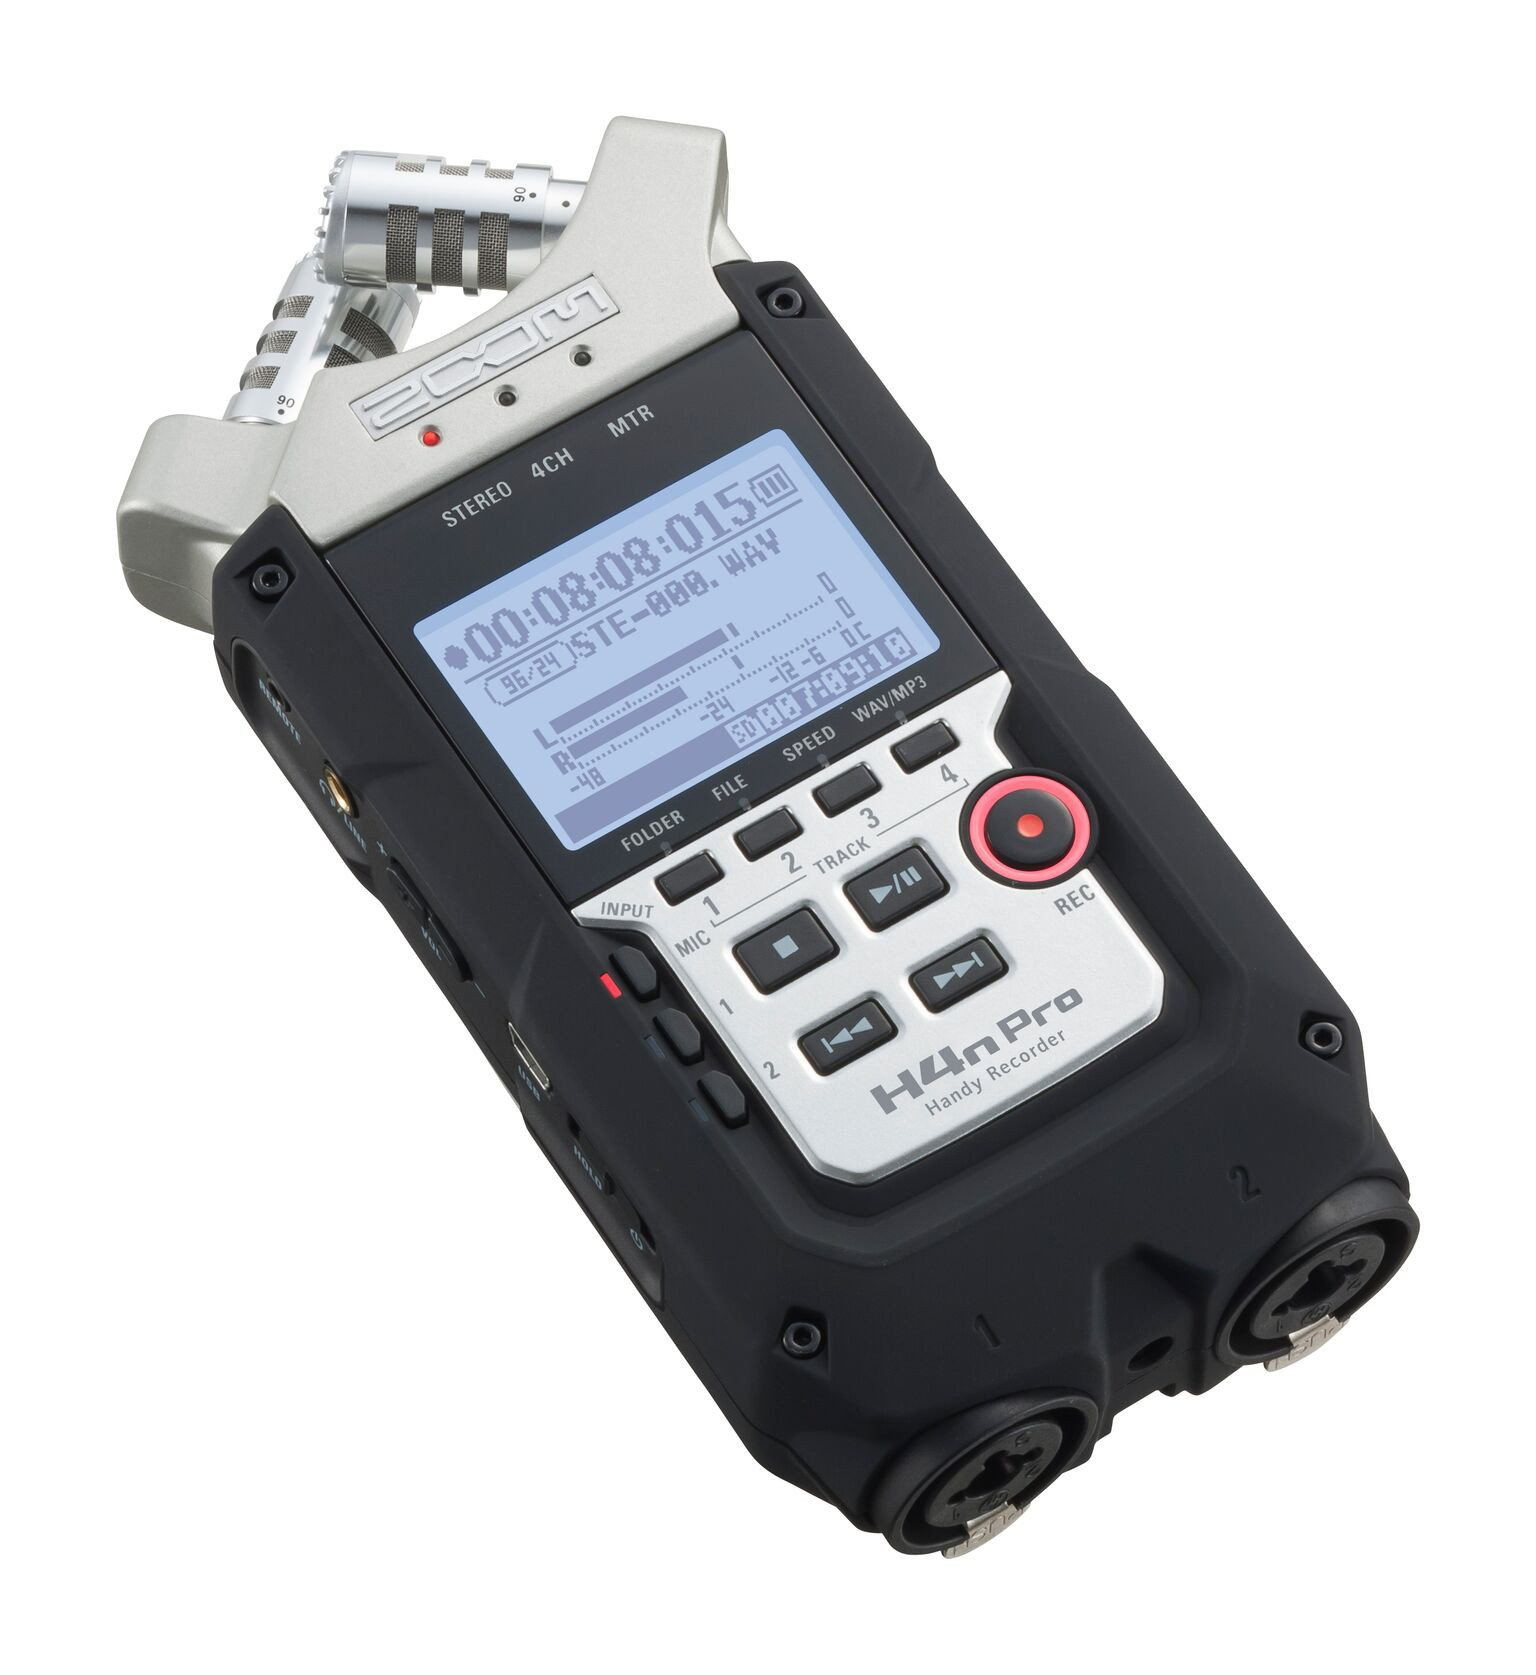 Handheld 4-Track Recorder